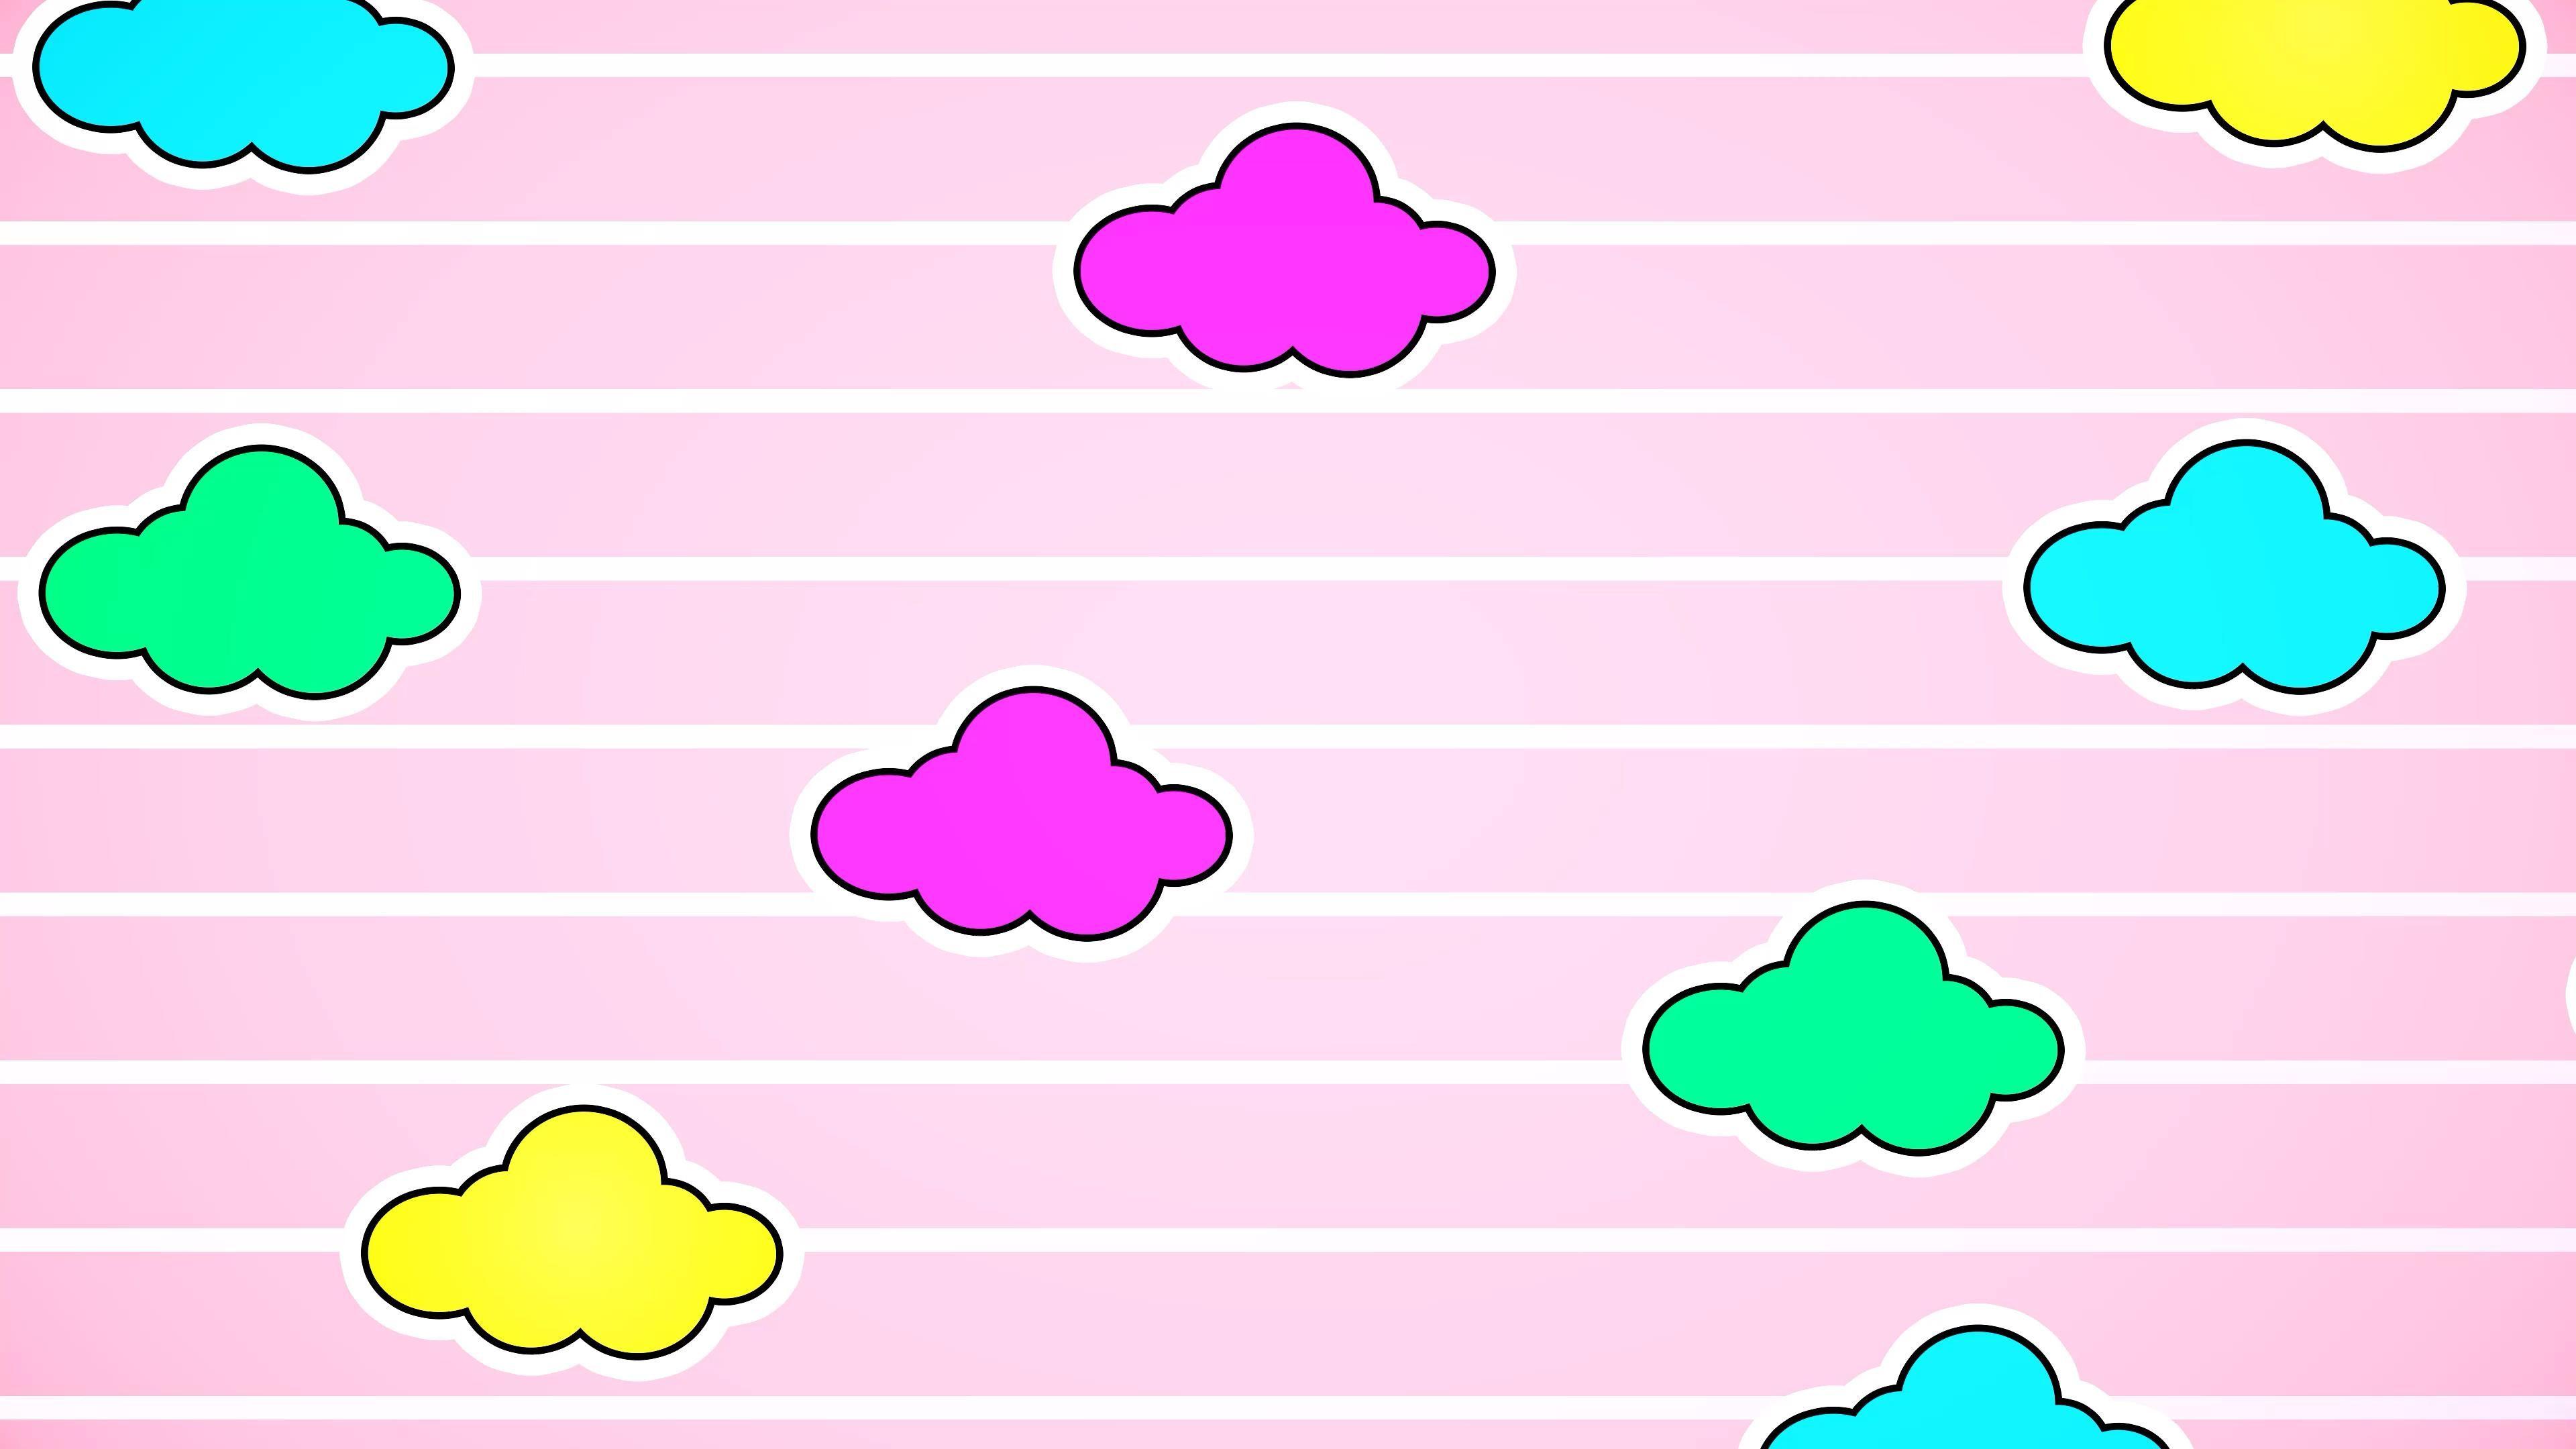 Free Motion Graphic Virtual Background ☁️ Kawaii Cloud Bright Pastel Pink VJ Loop